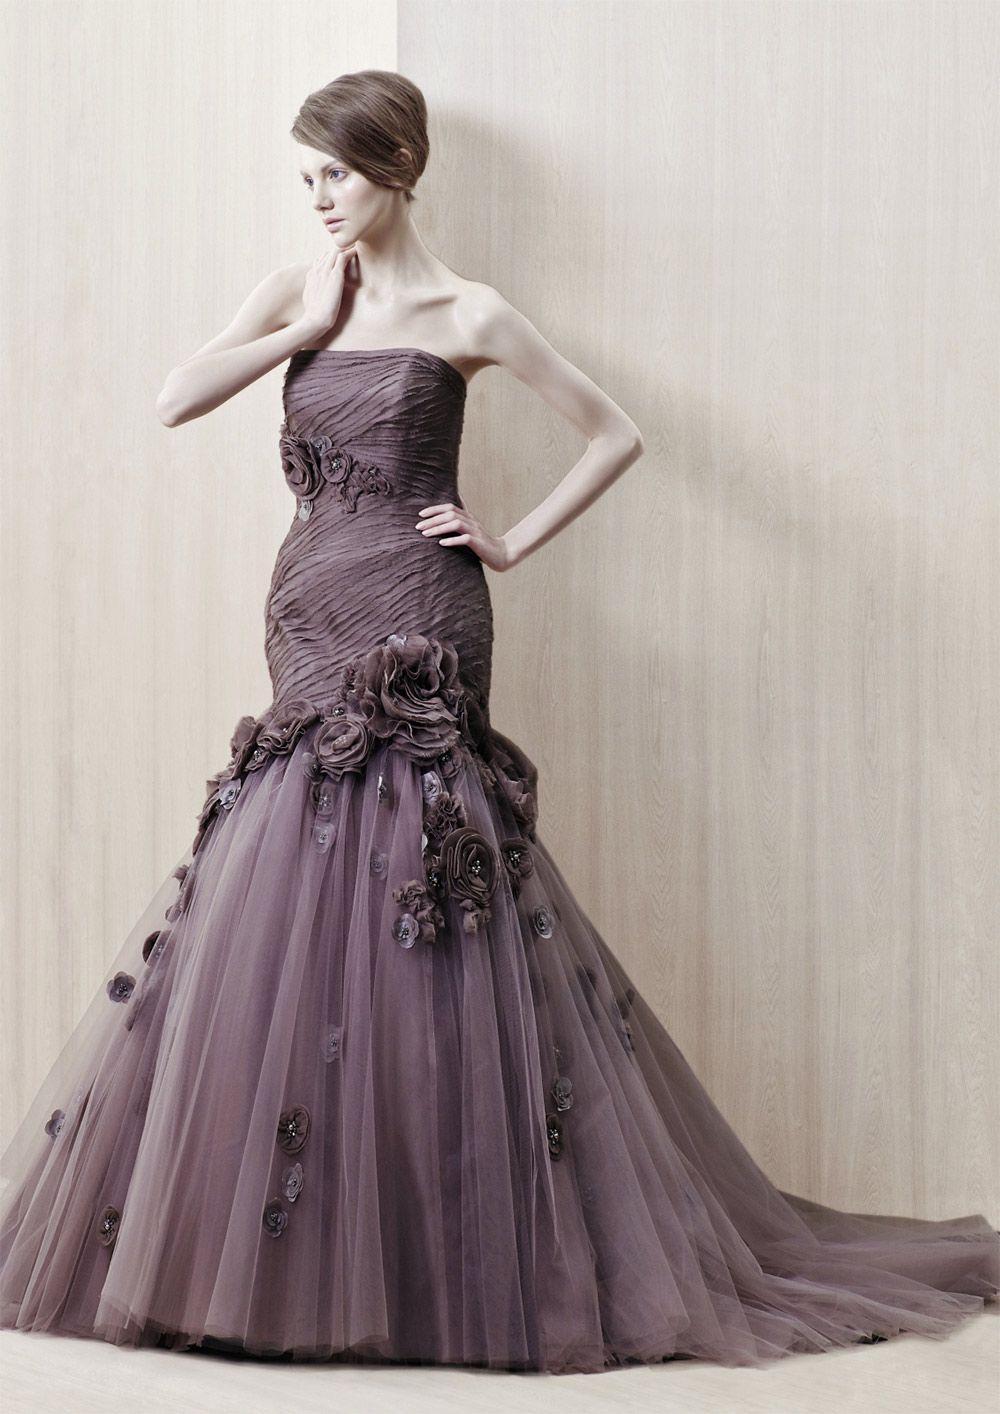 21 Fabulous Gothic Wedding Dress Ideas | Wedding Dresses | Pinterest ...